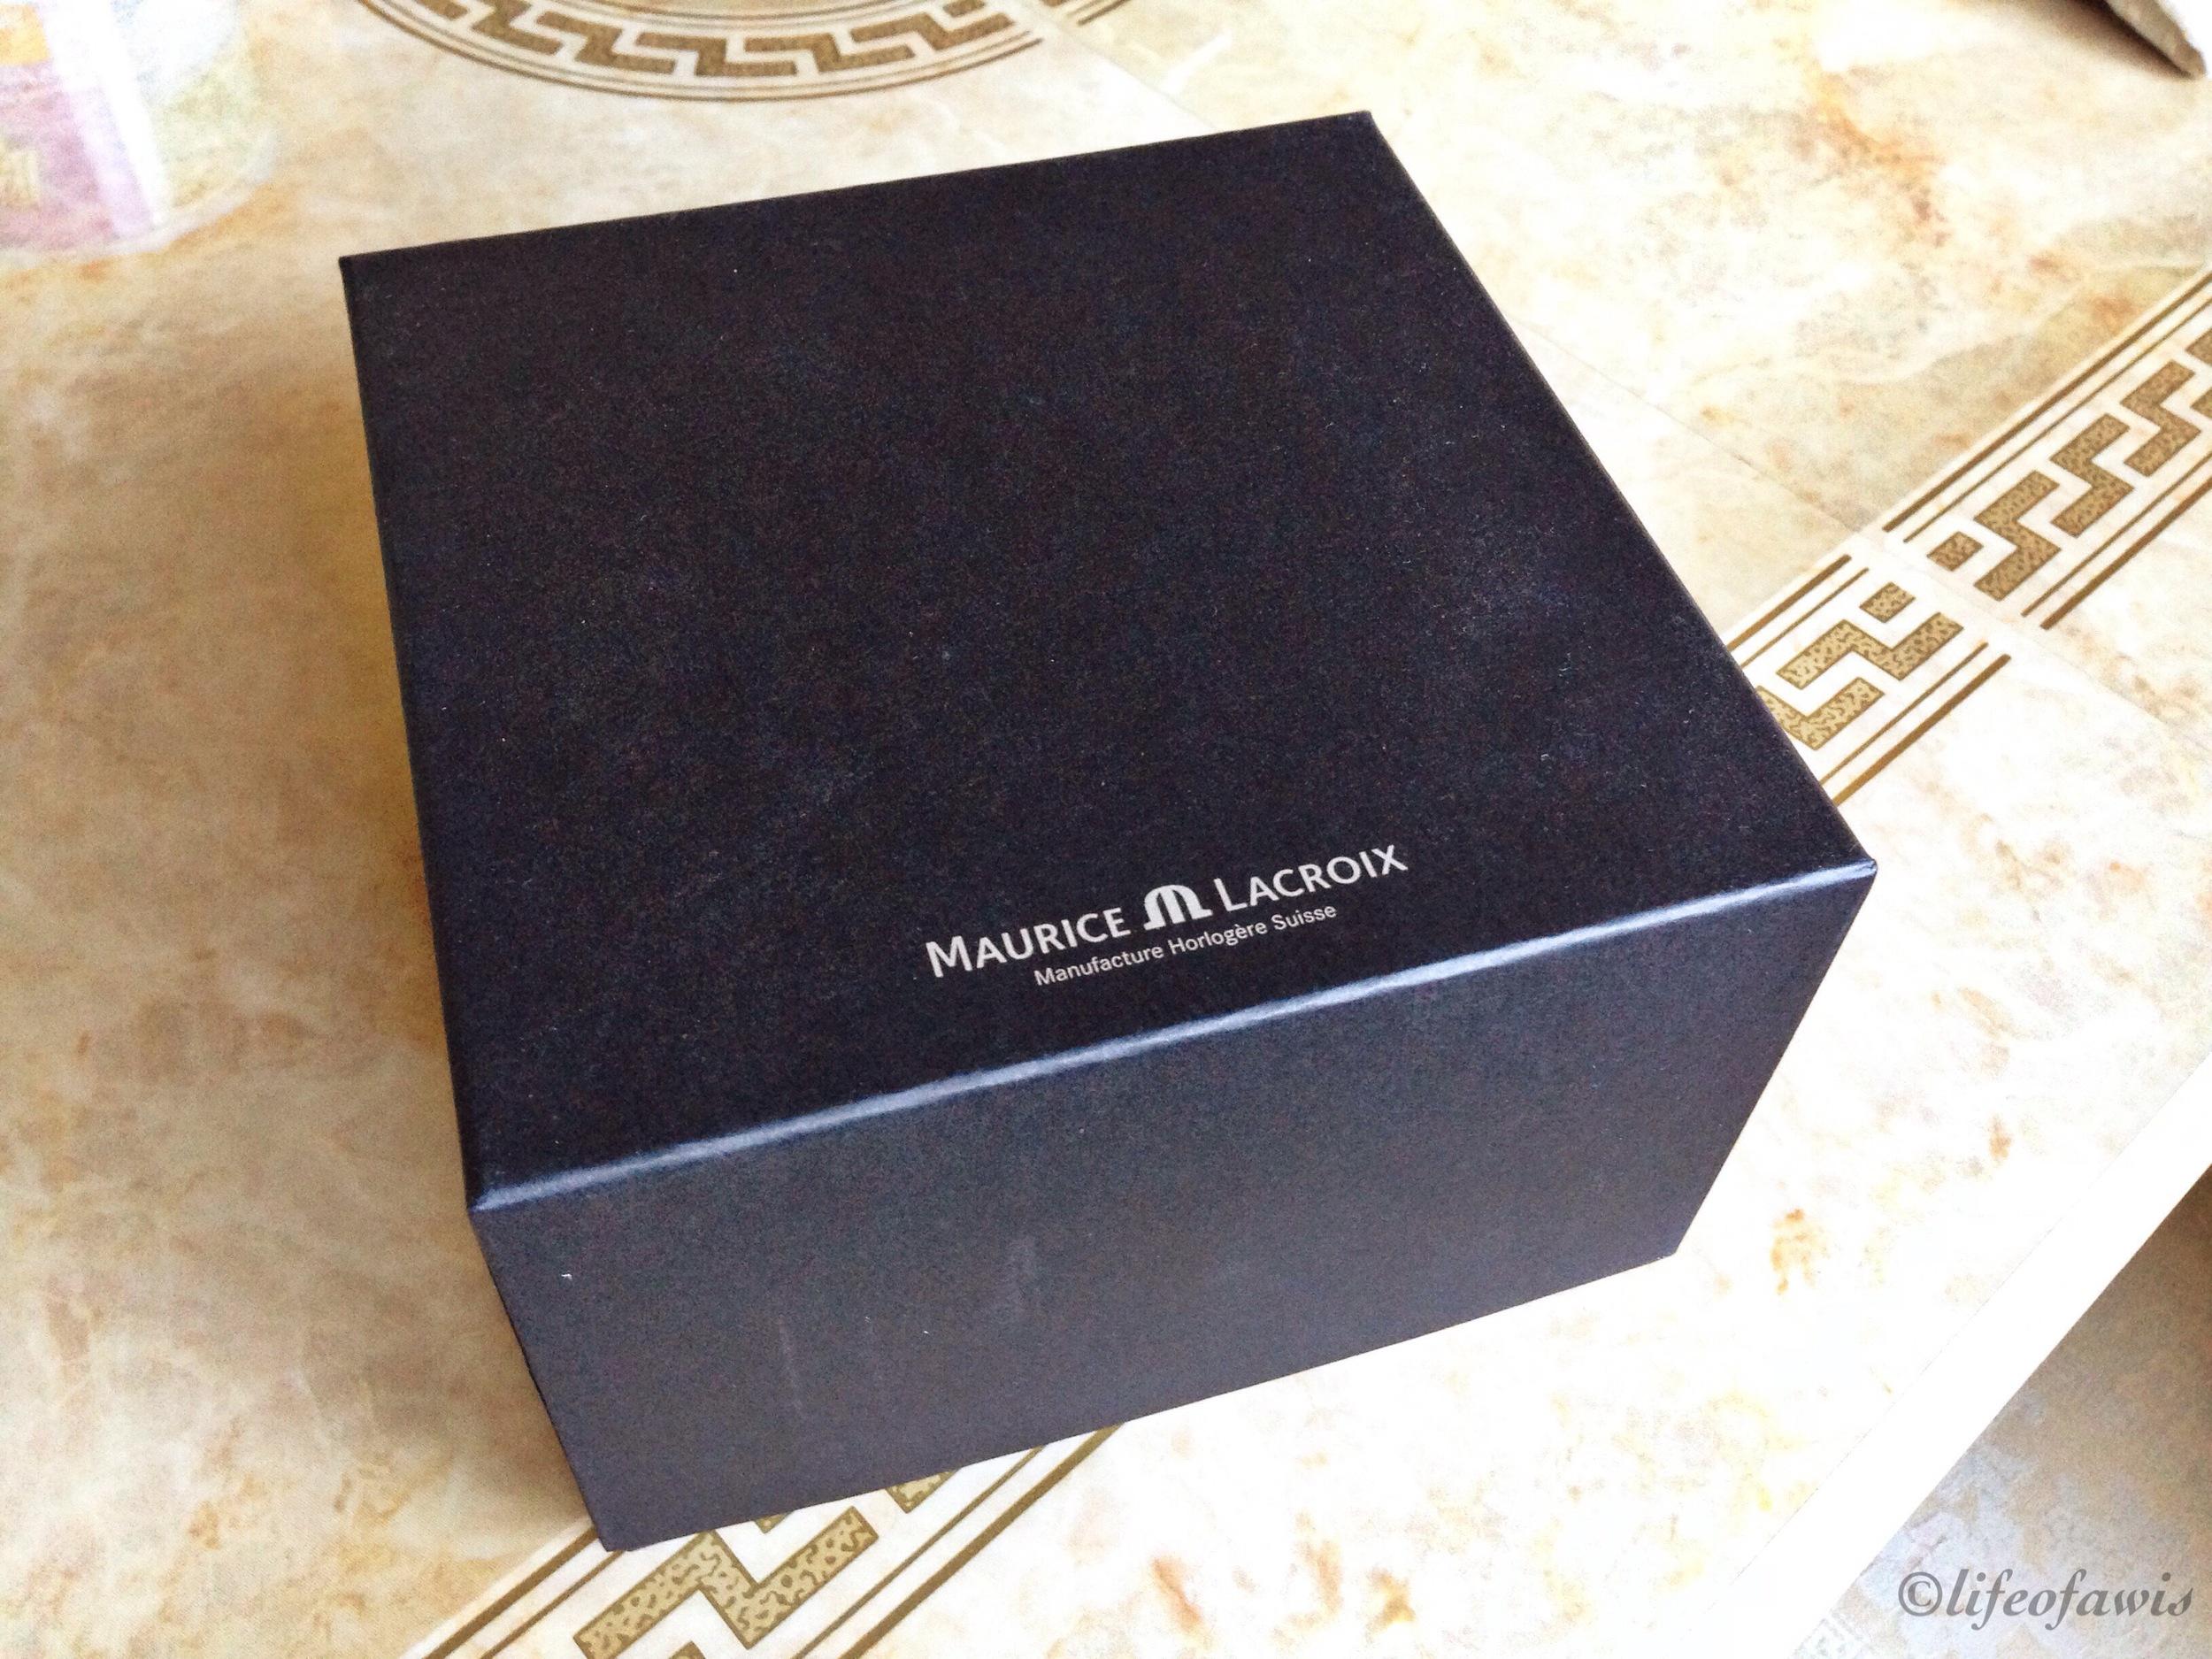 maurice-lacroix-box